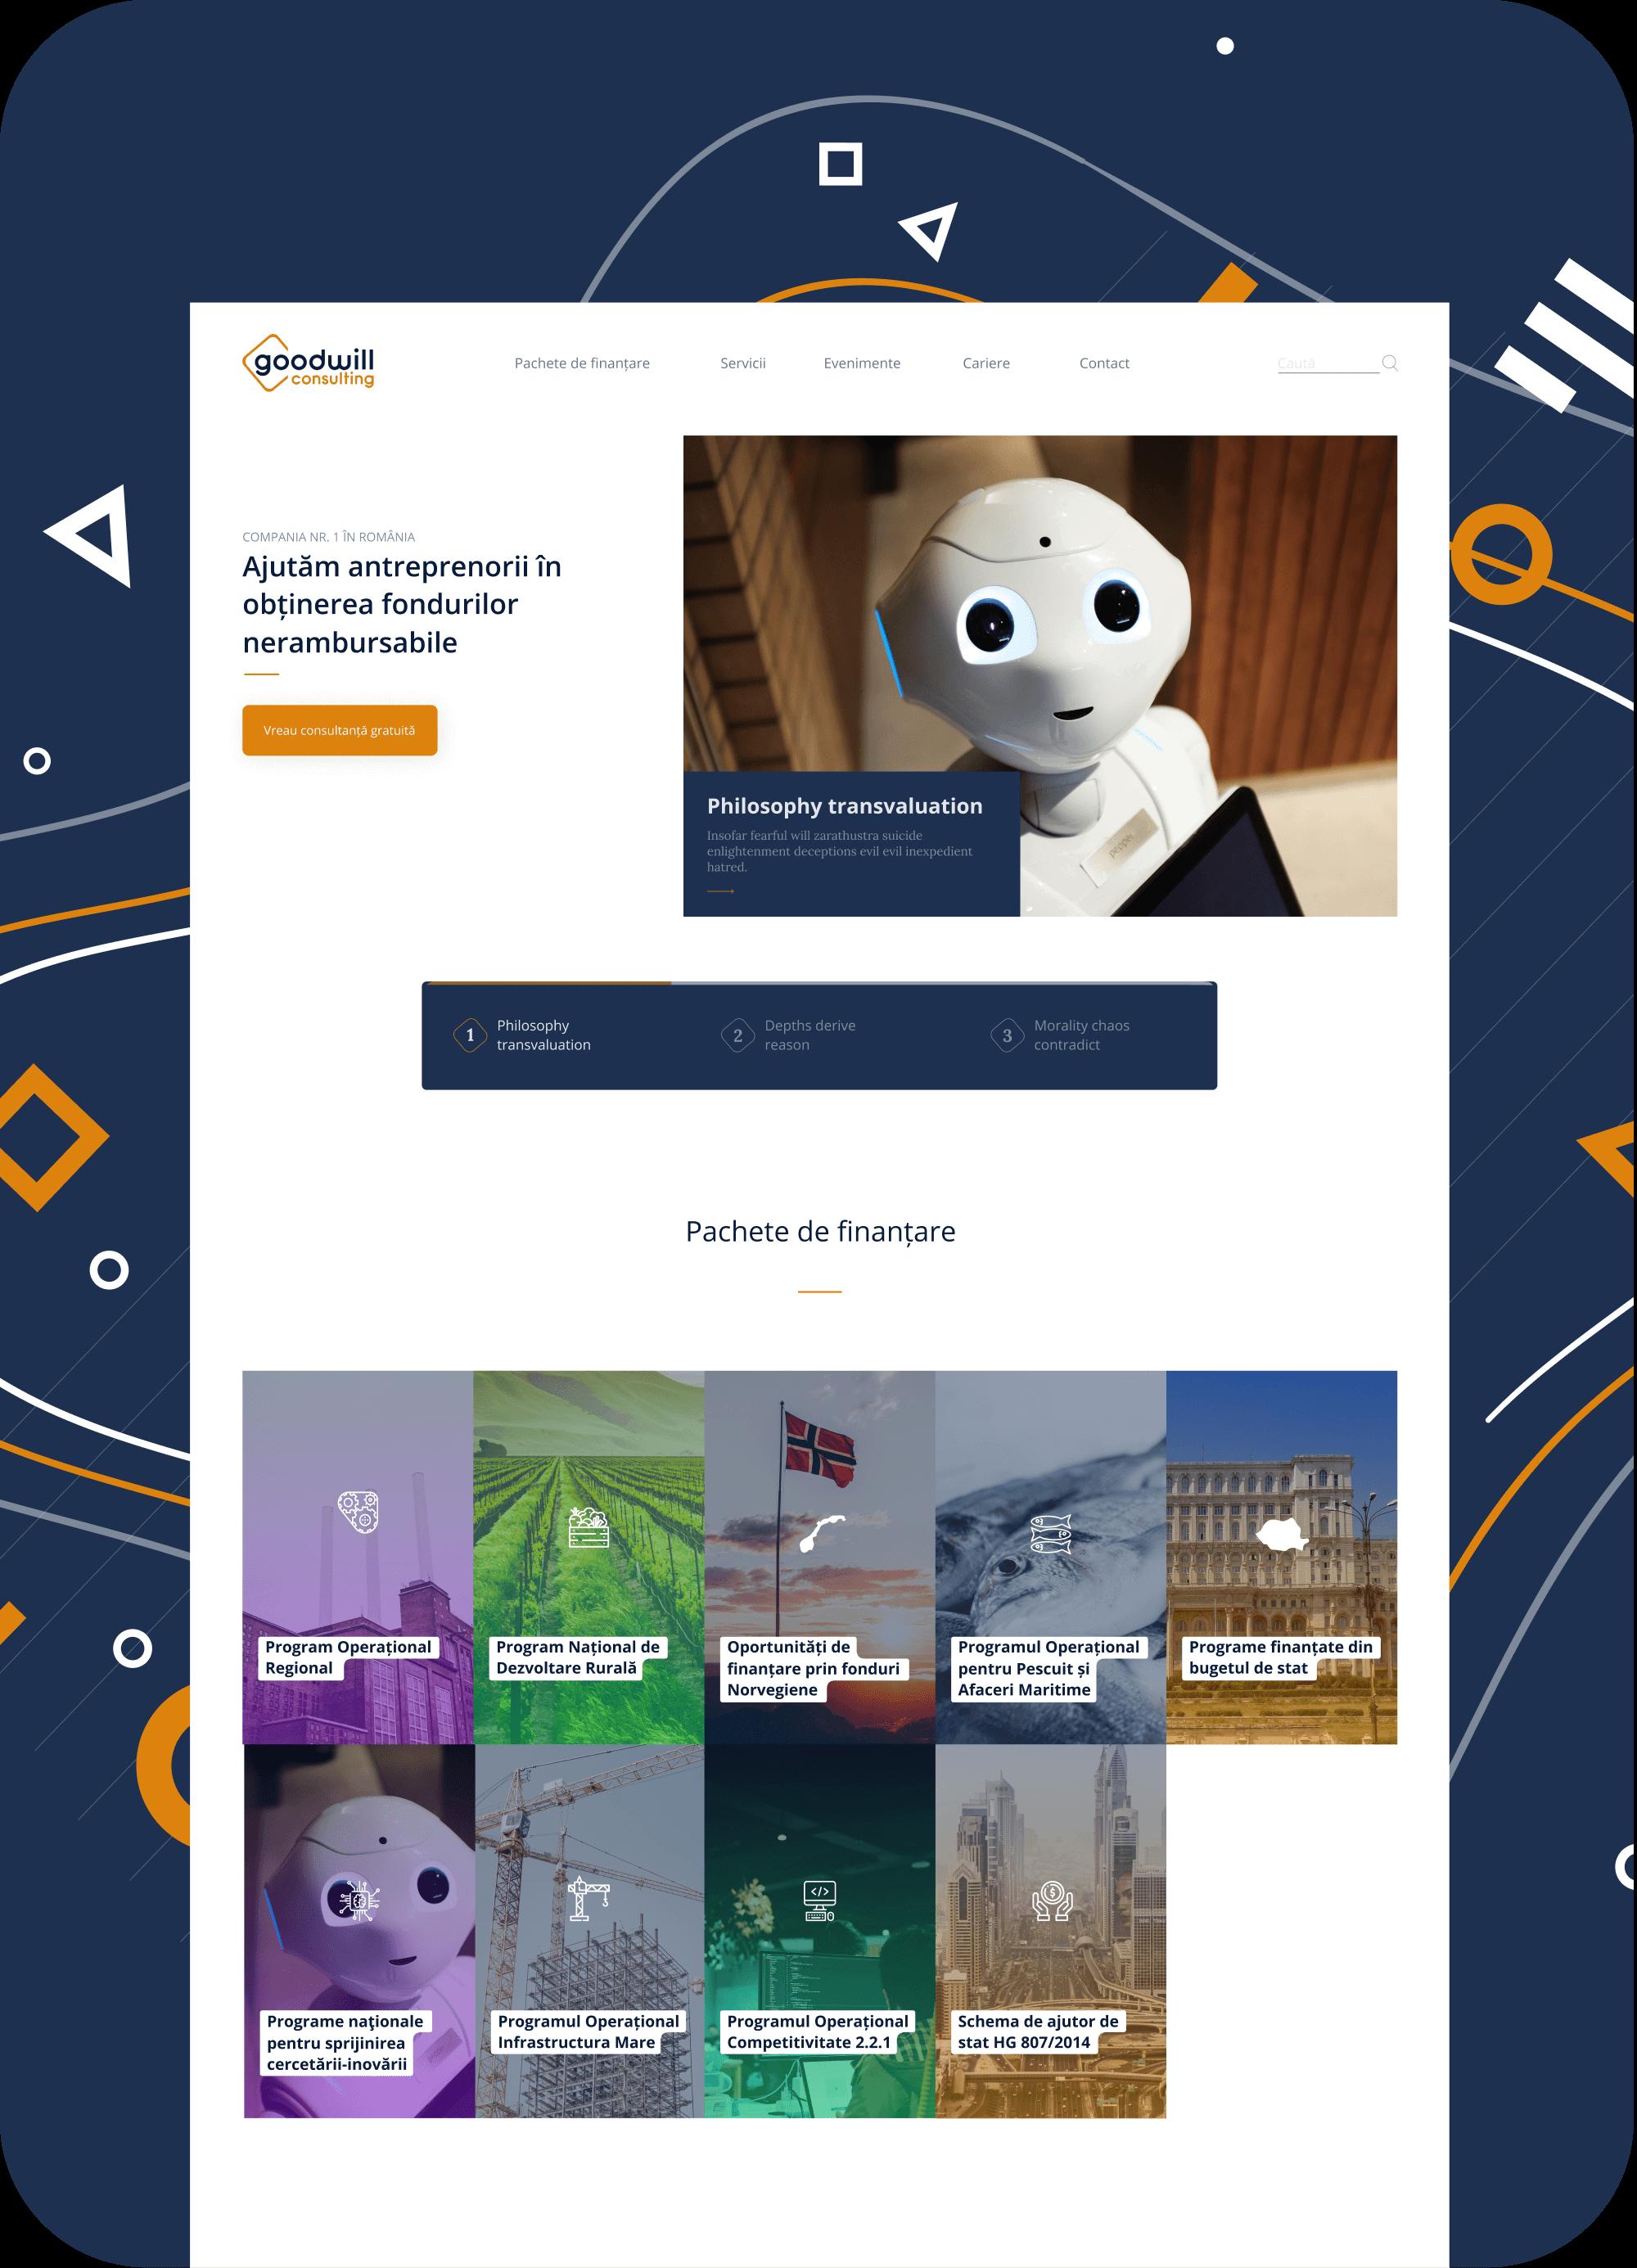 Goodwill consulting EU funds Webflow development Alexyo Web design